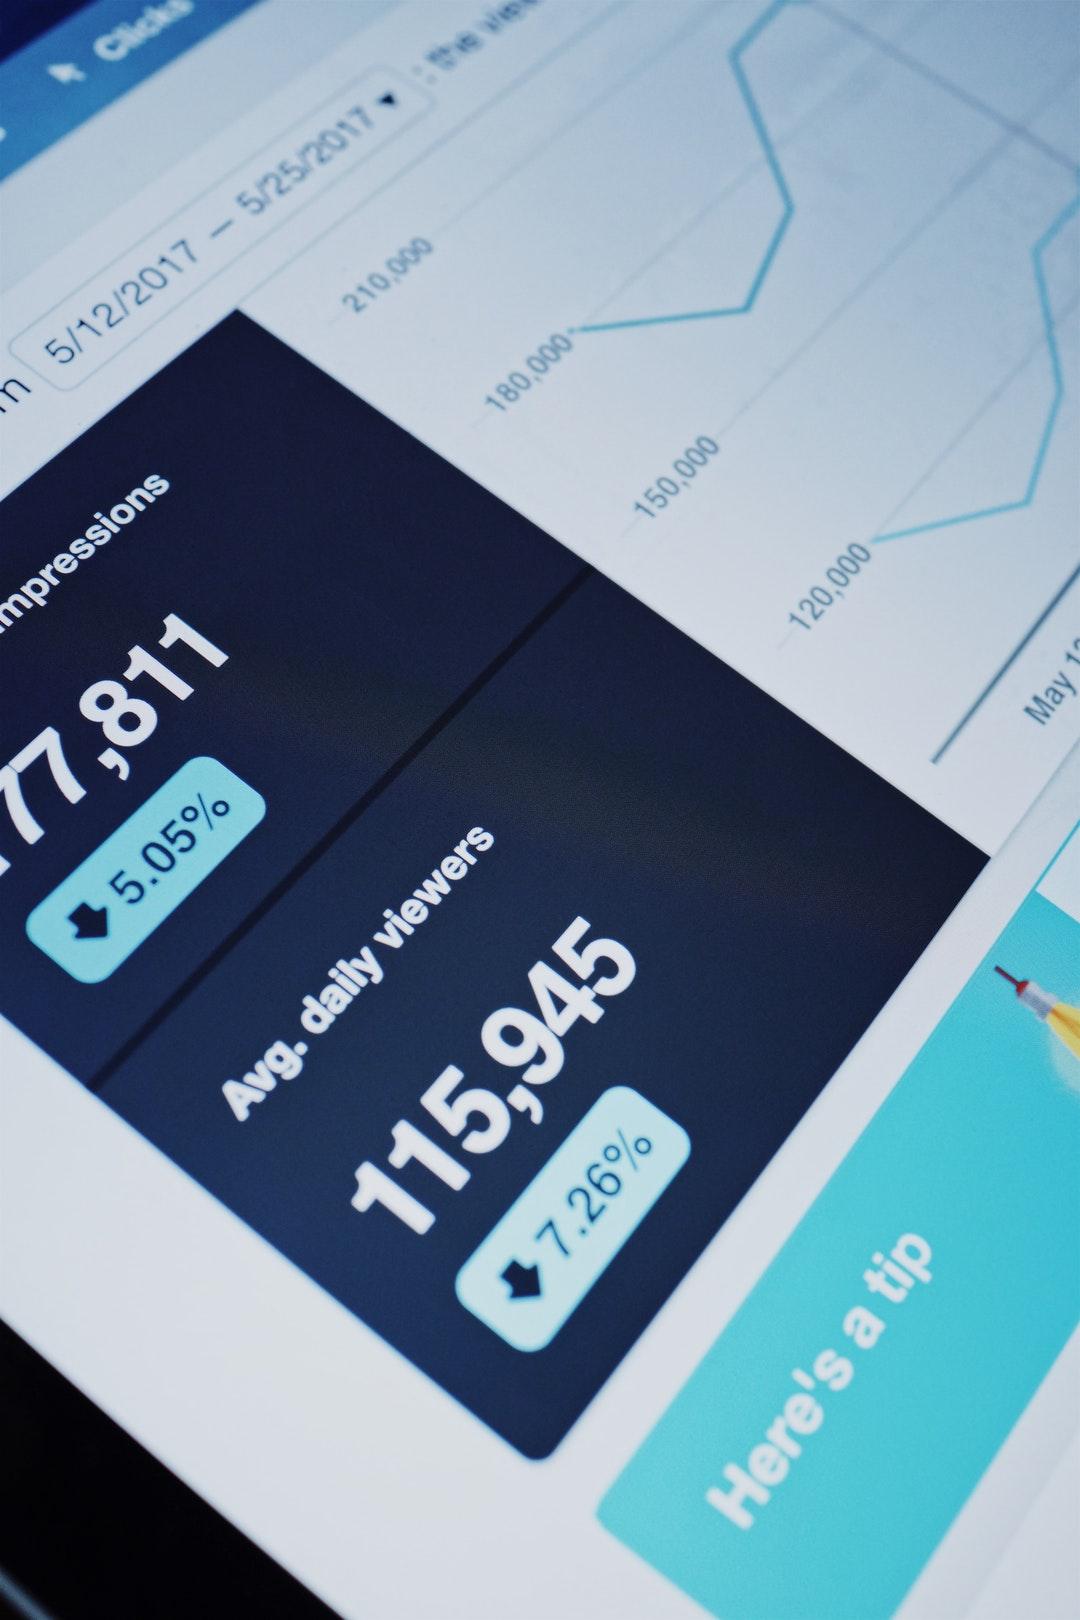 seo metrics to track performance